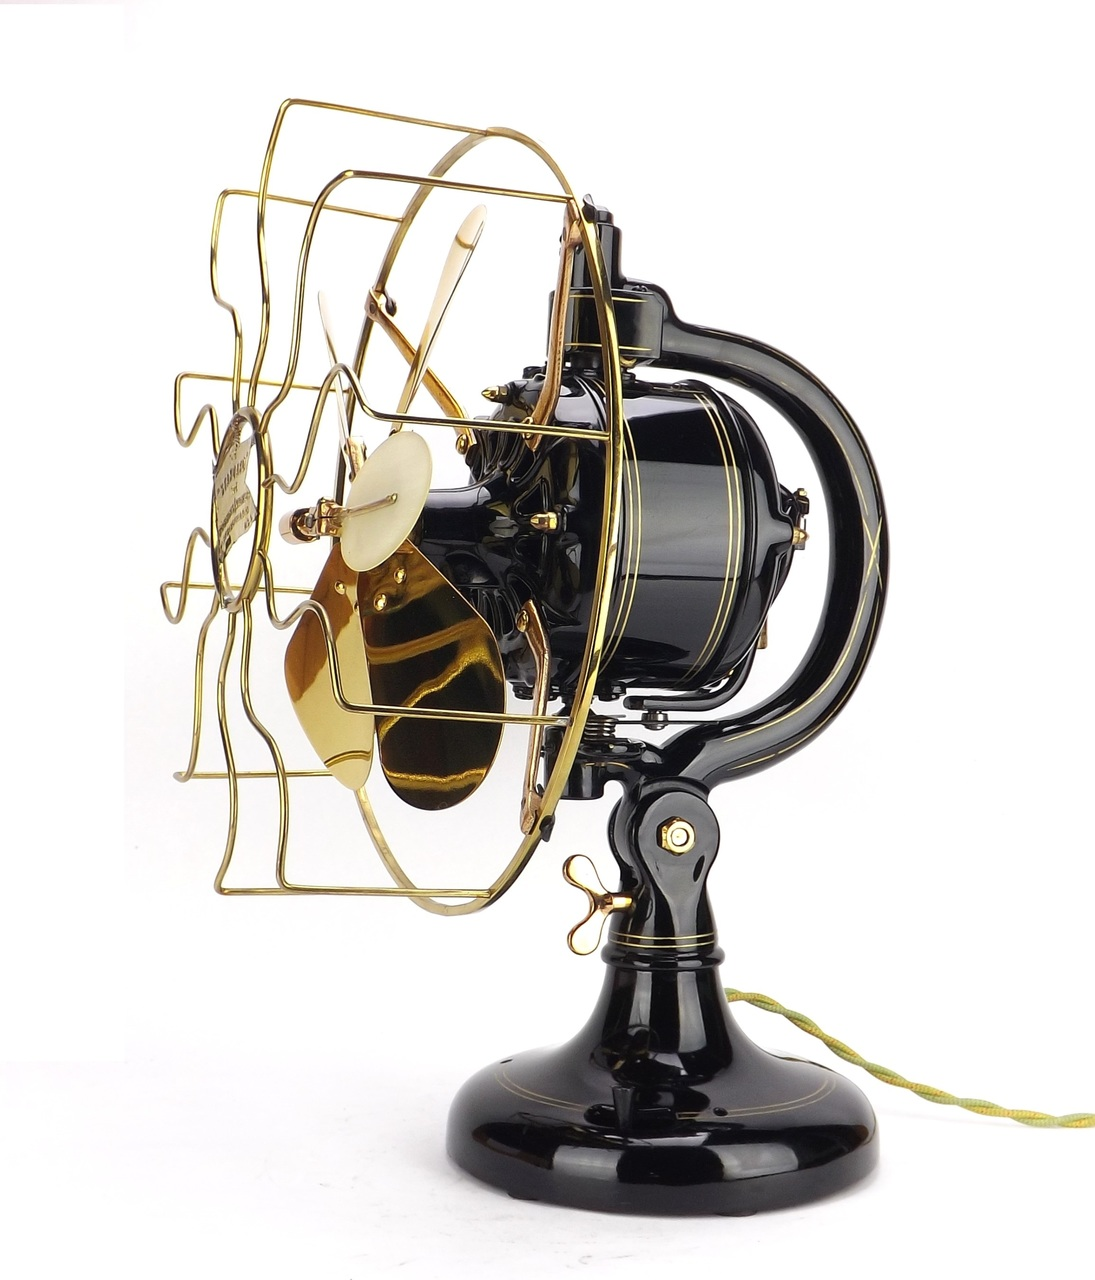 "Rare 12"" Robbins & Myers Feathervane Oscillator Professionally Restored"